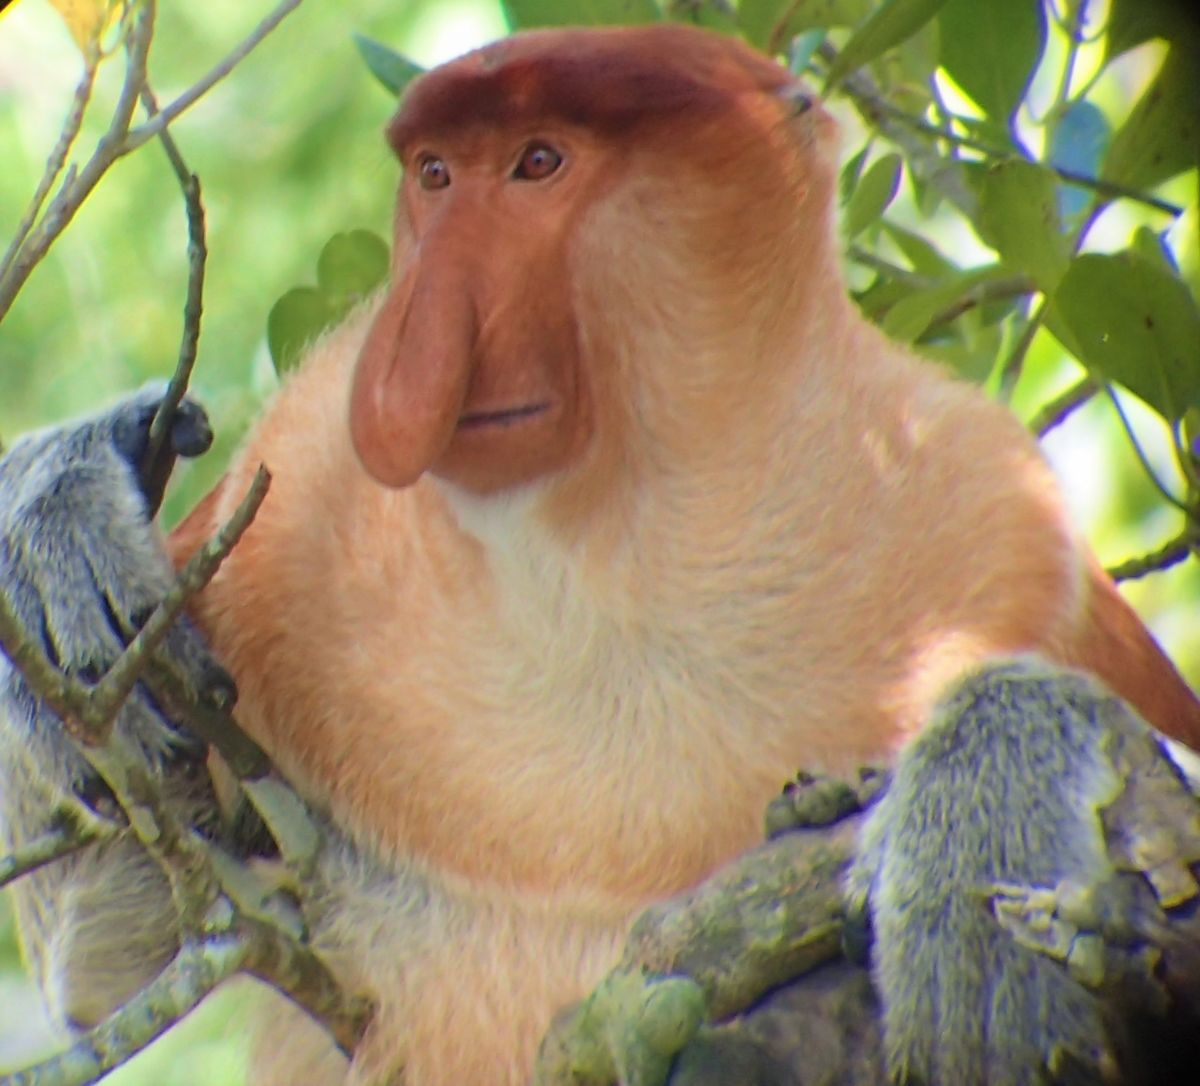 Problems for Proboscis! – Gretchen Coffman